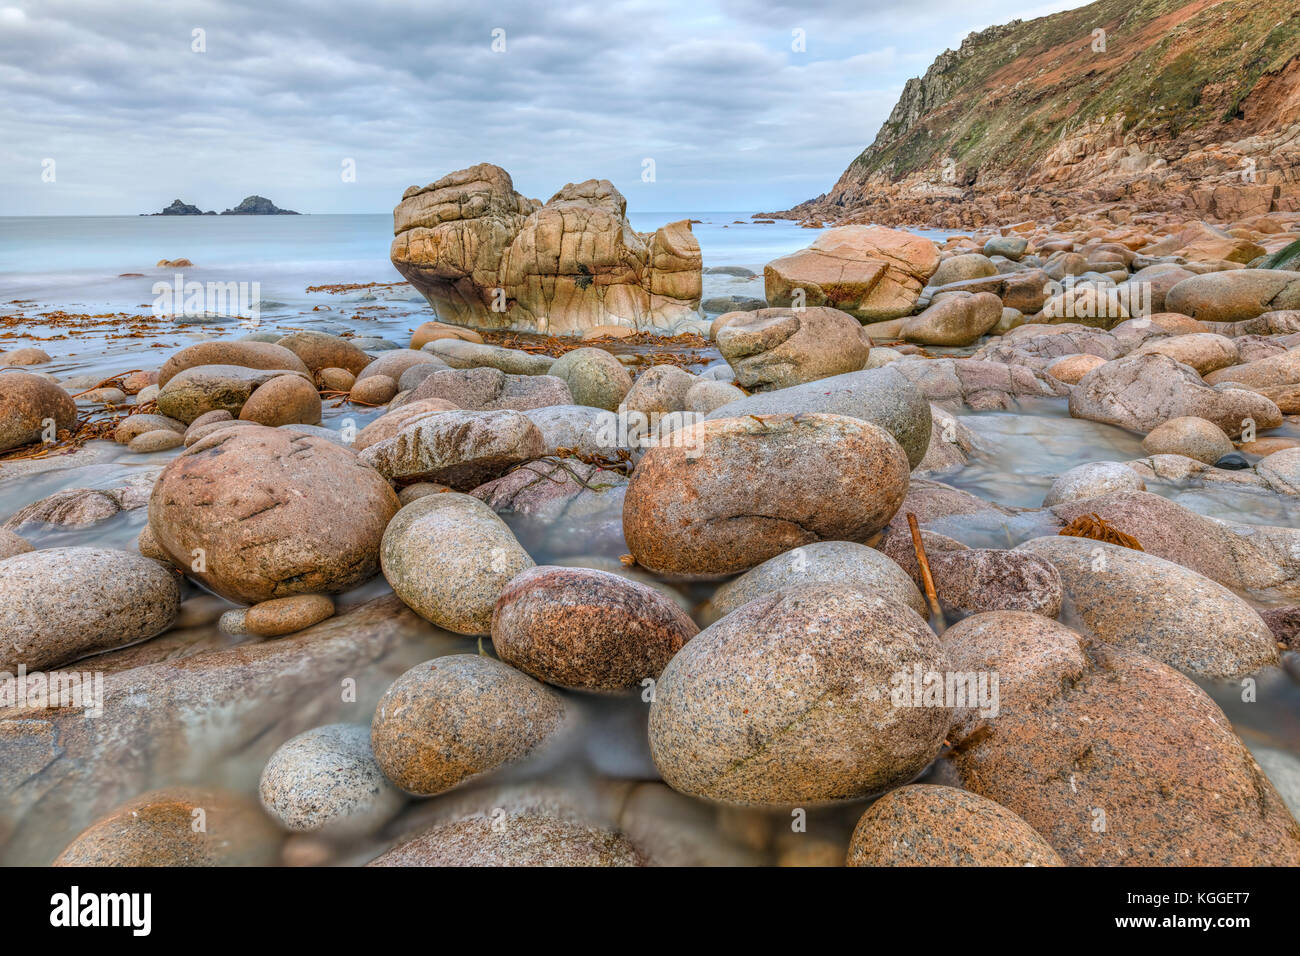 Porth Nanven, Cornwall, England, United Kingdom - Stock Image